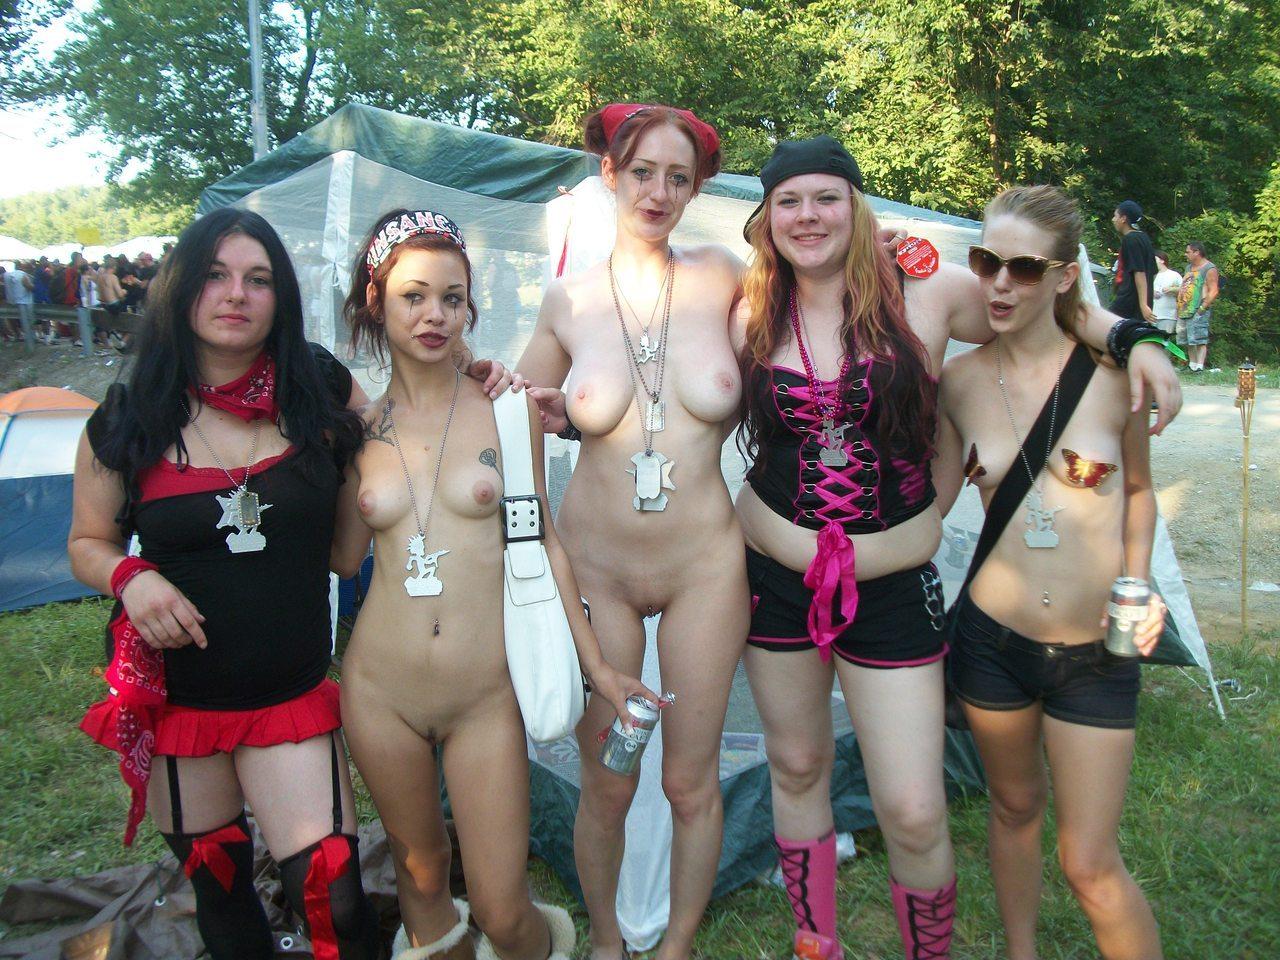 largest gathering of nude girls